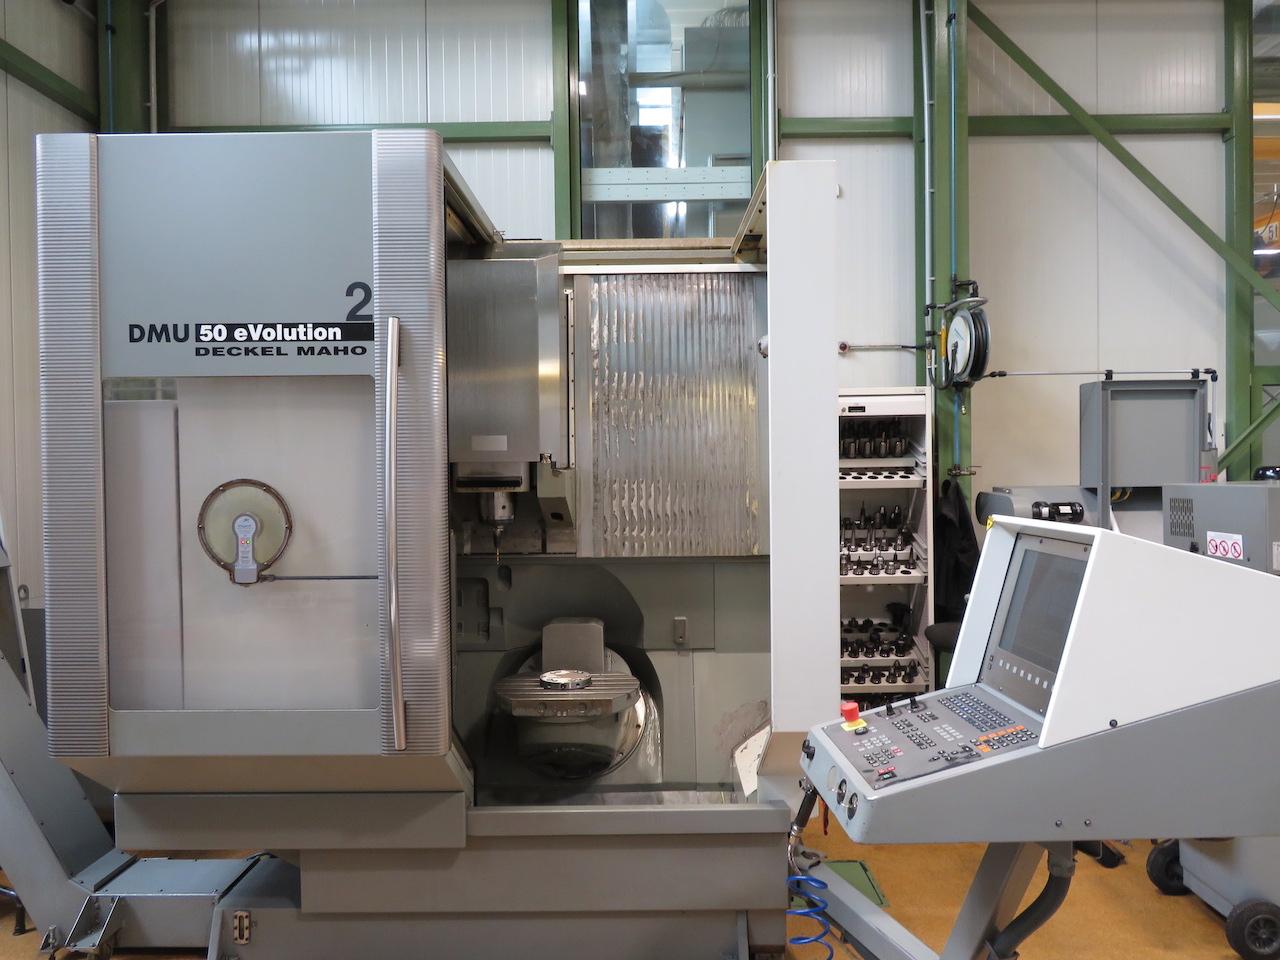 used  Machining Center - Vertical Deckel Maho DMU 50 eVolution